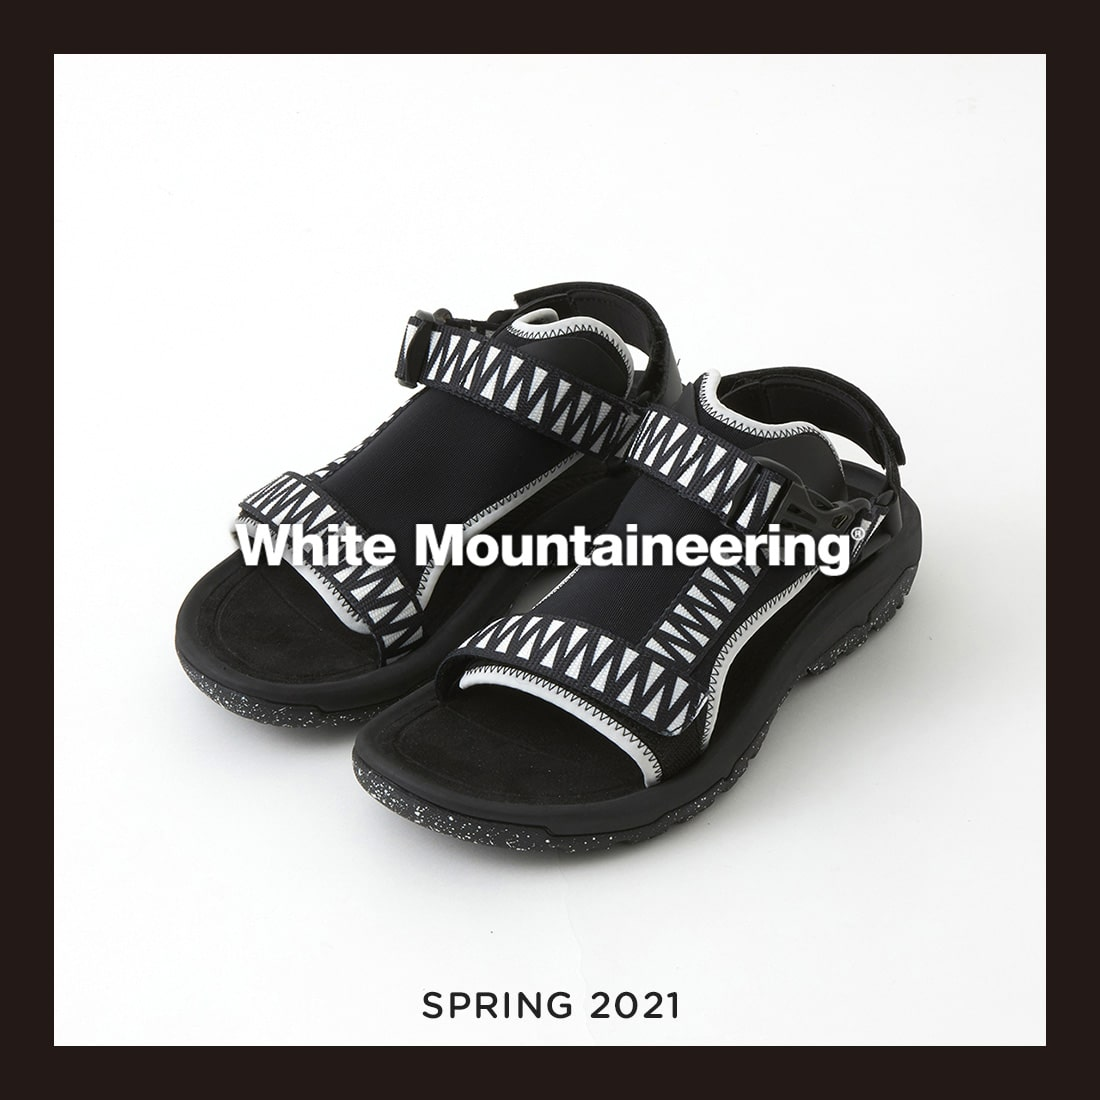 HURRICANE VOLT - WHITE MOUNTAINEERING